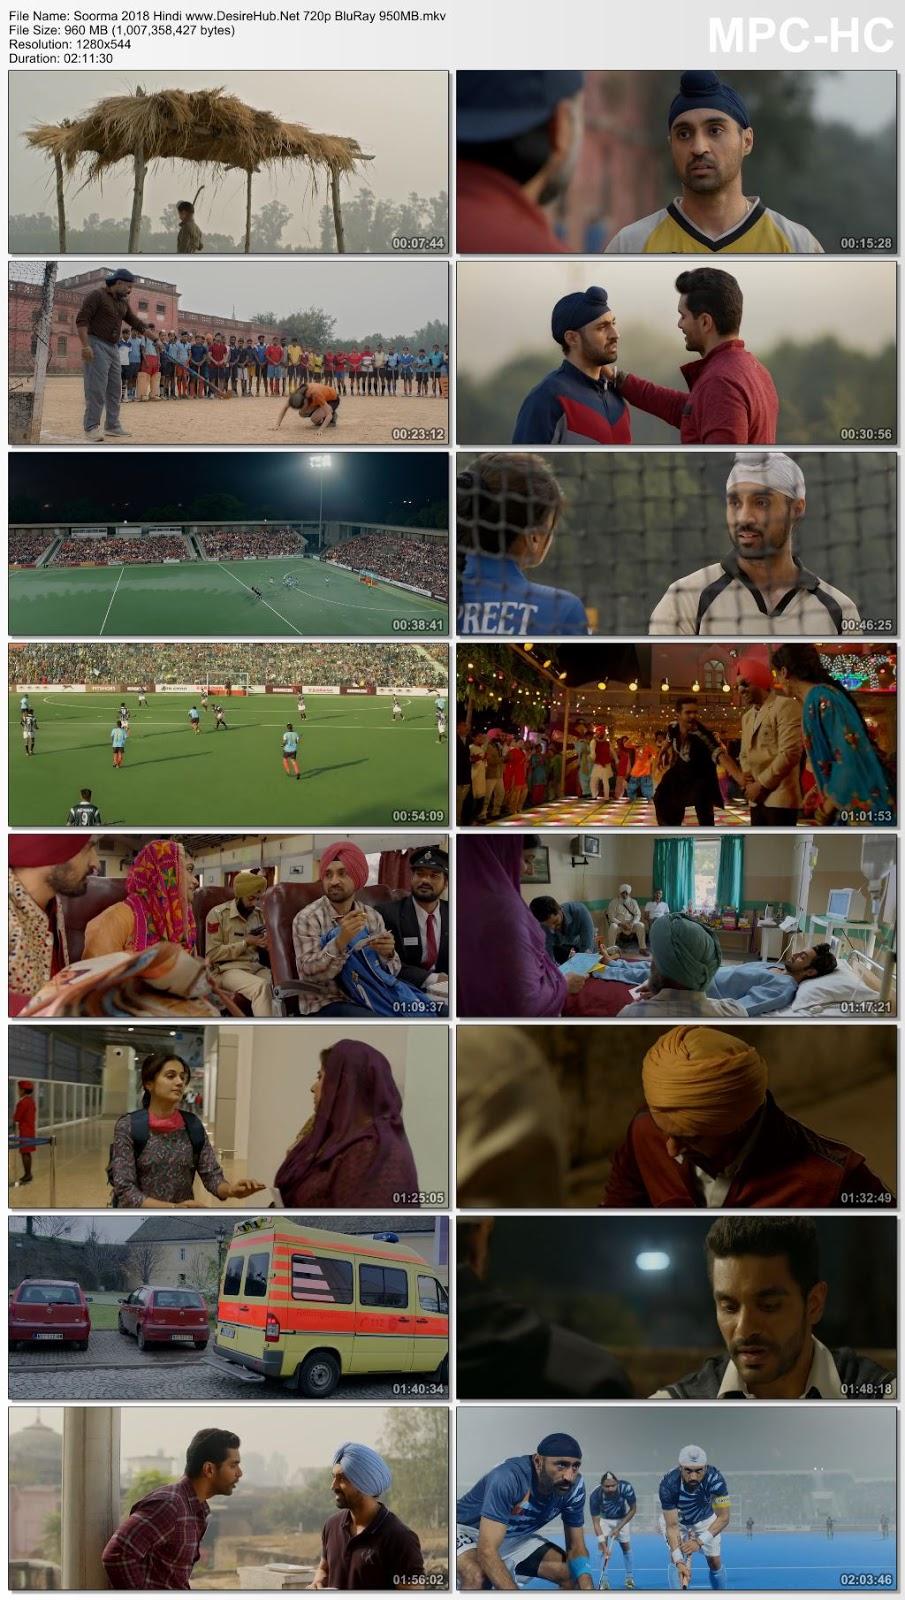 Soorma 2018 Hindi 720p BluRay 950MB Desirehub